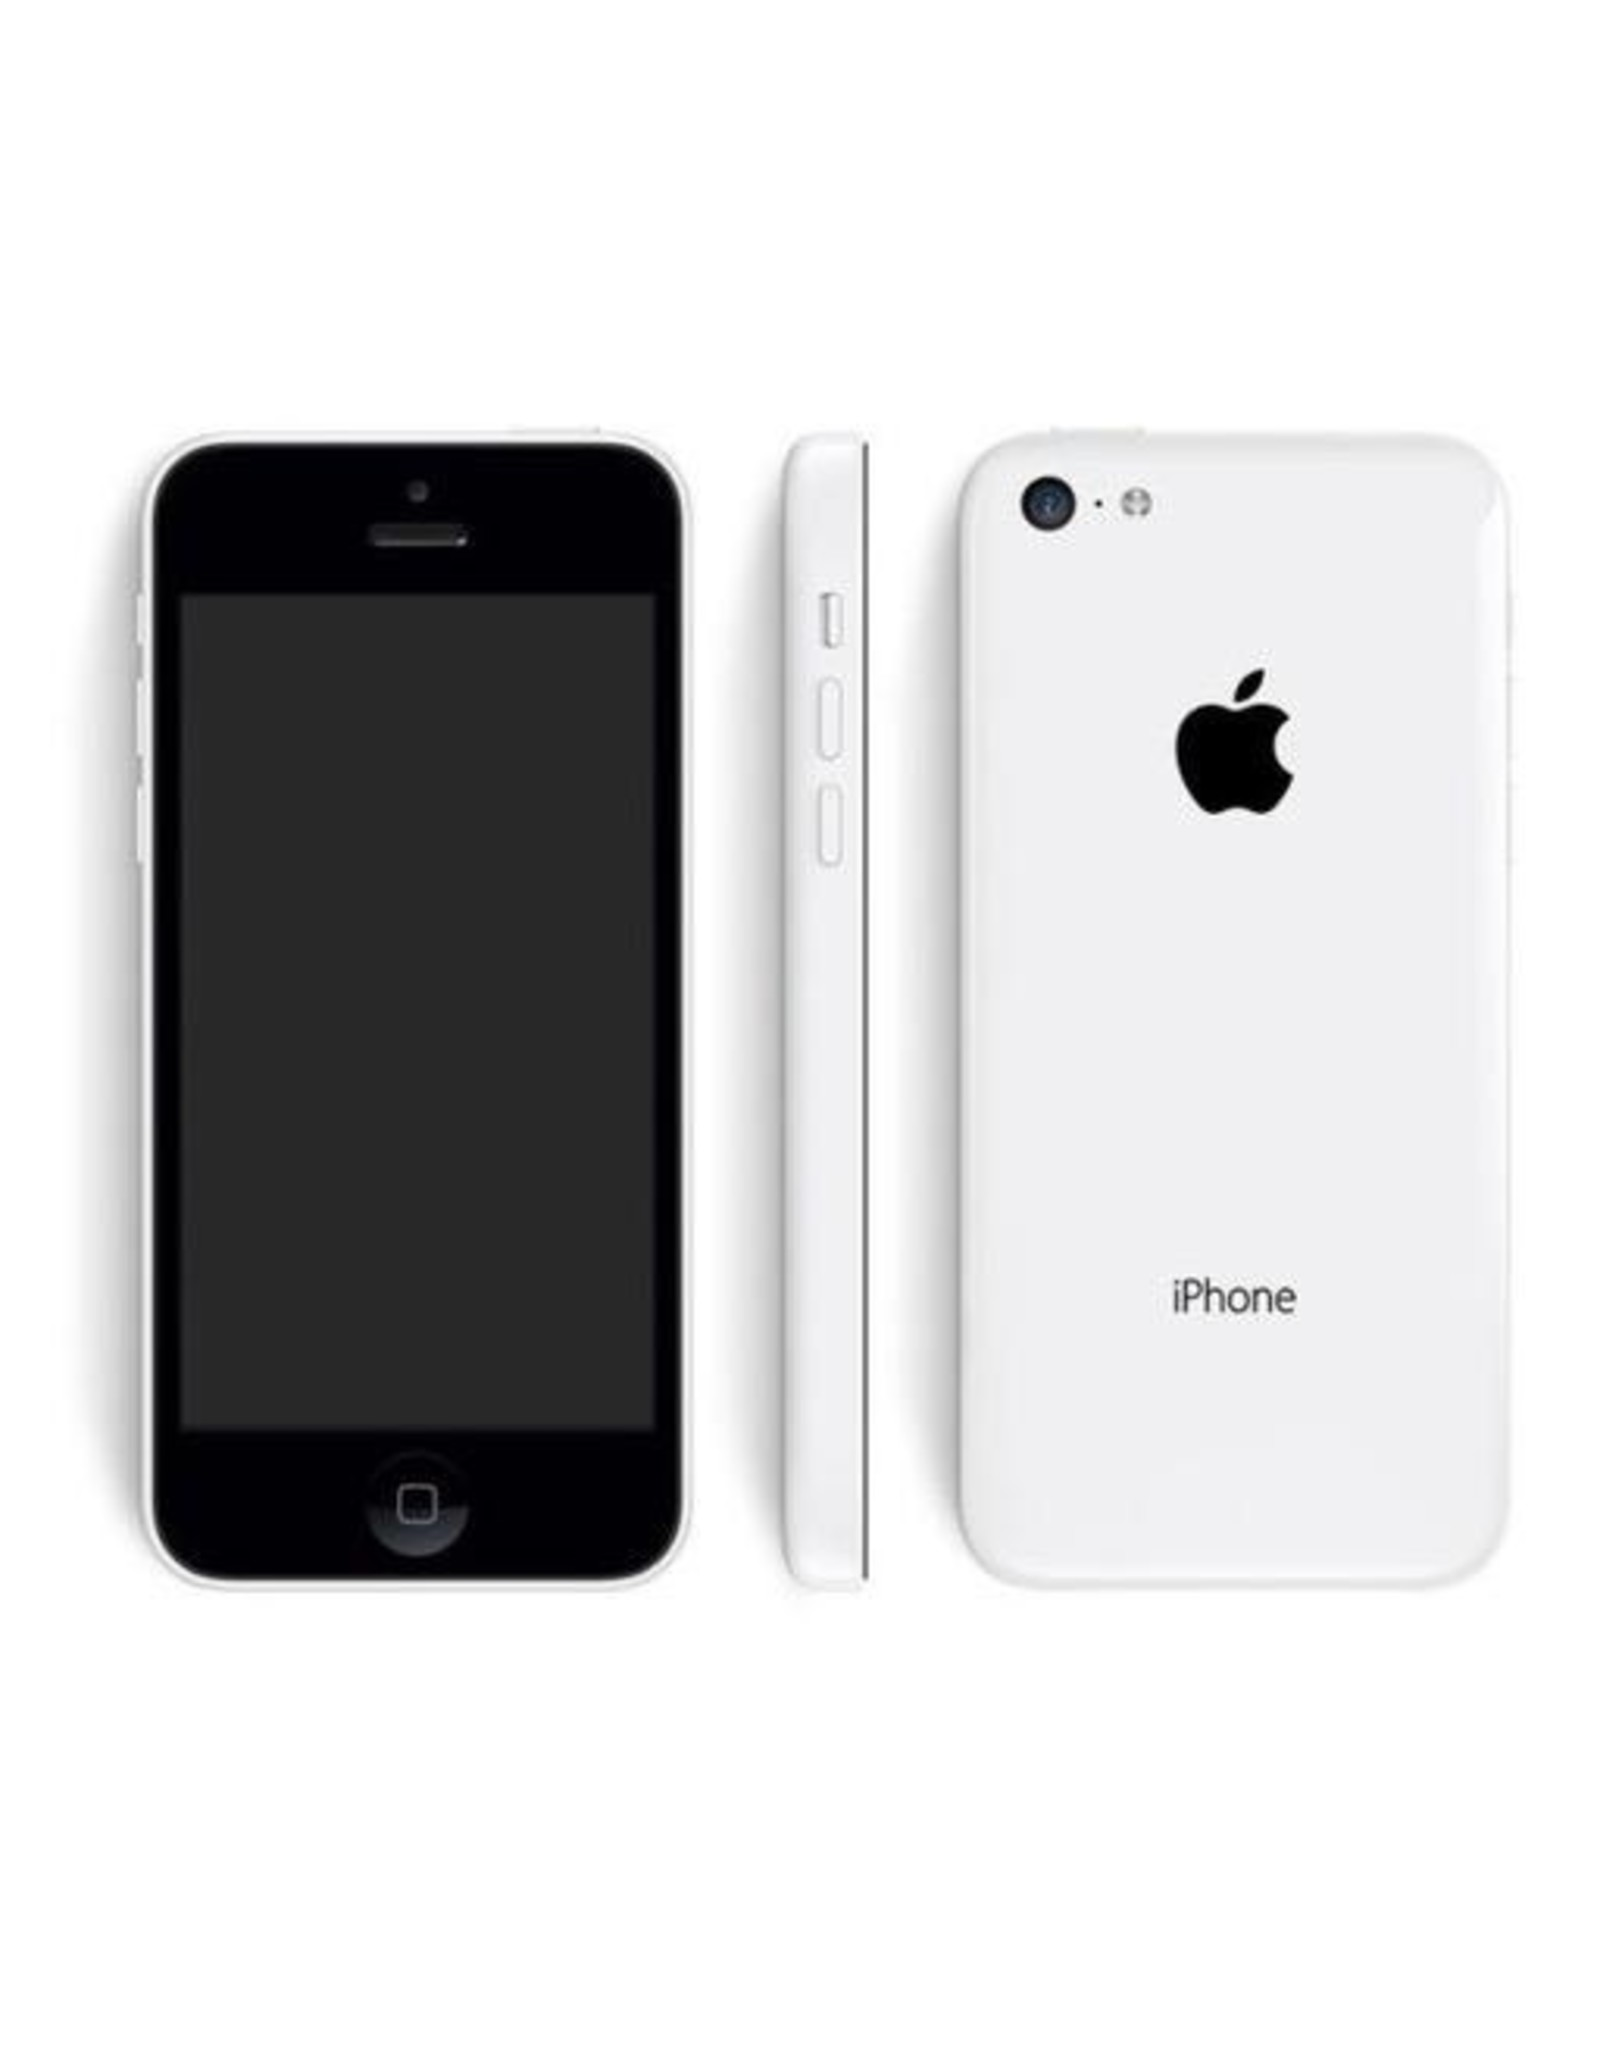 Apple iPhone 5c (16GB, White) - 30 Day Exchange